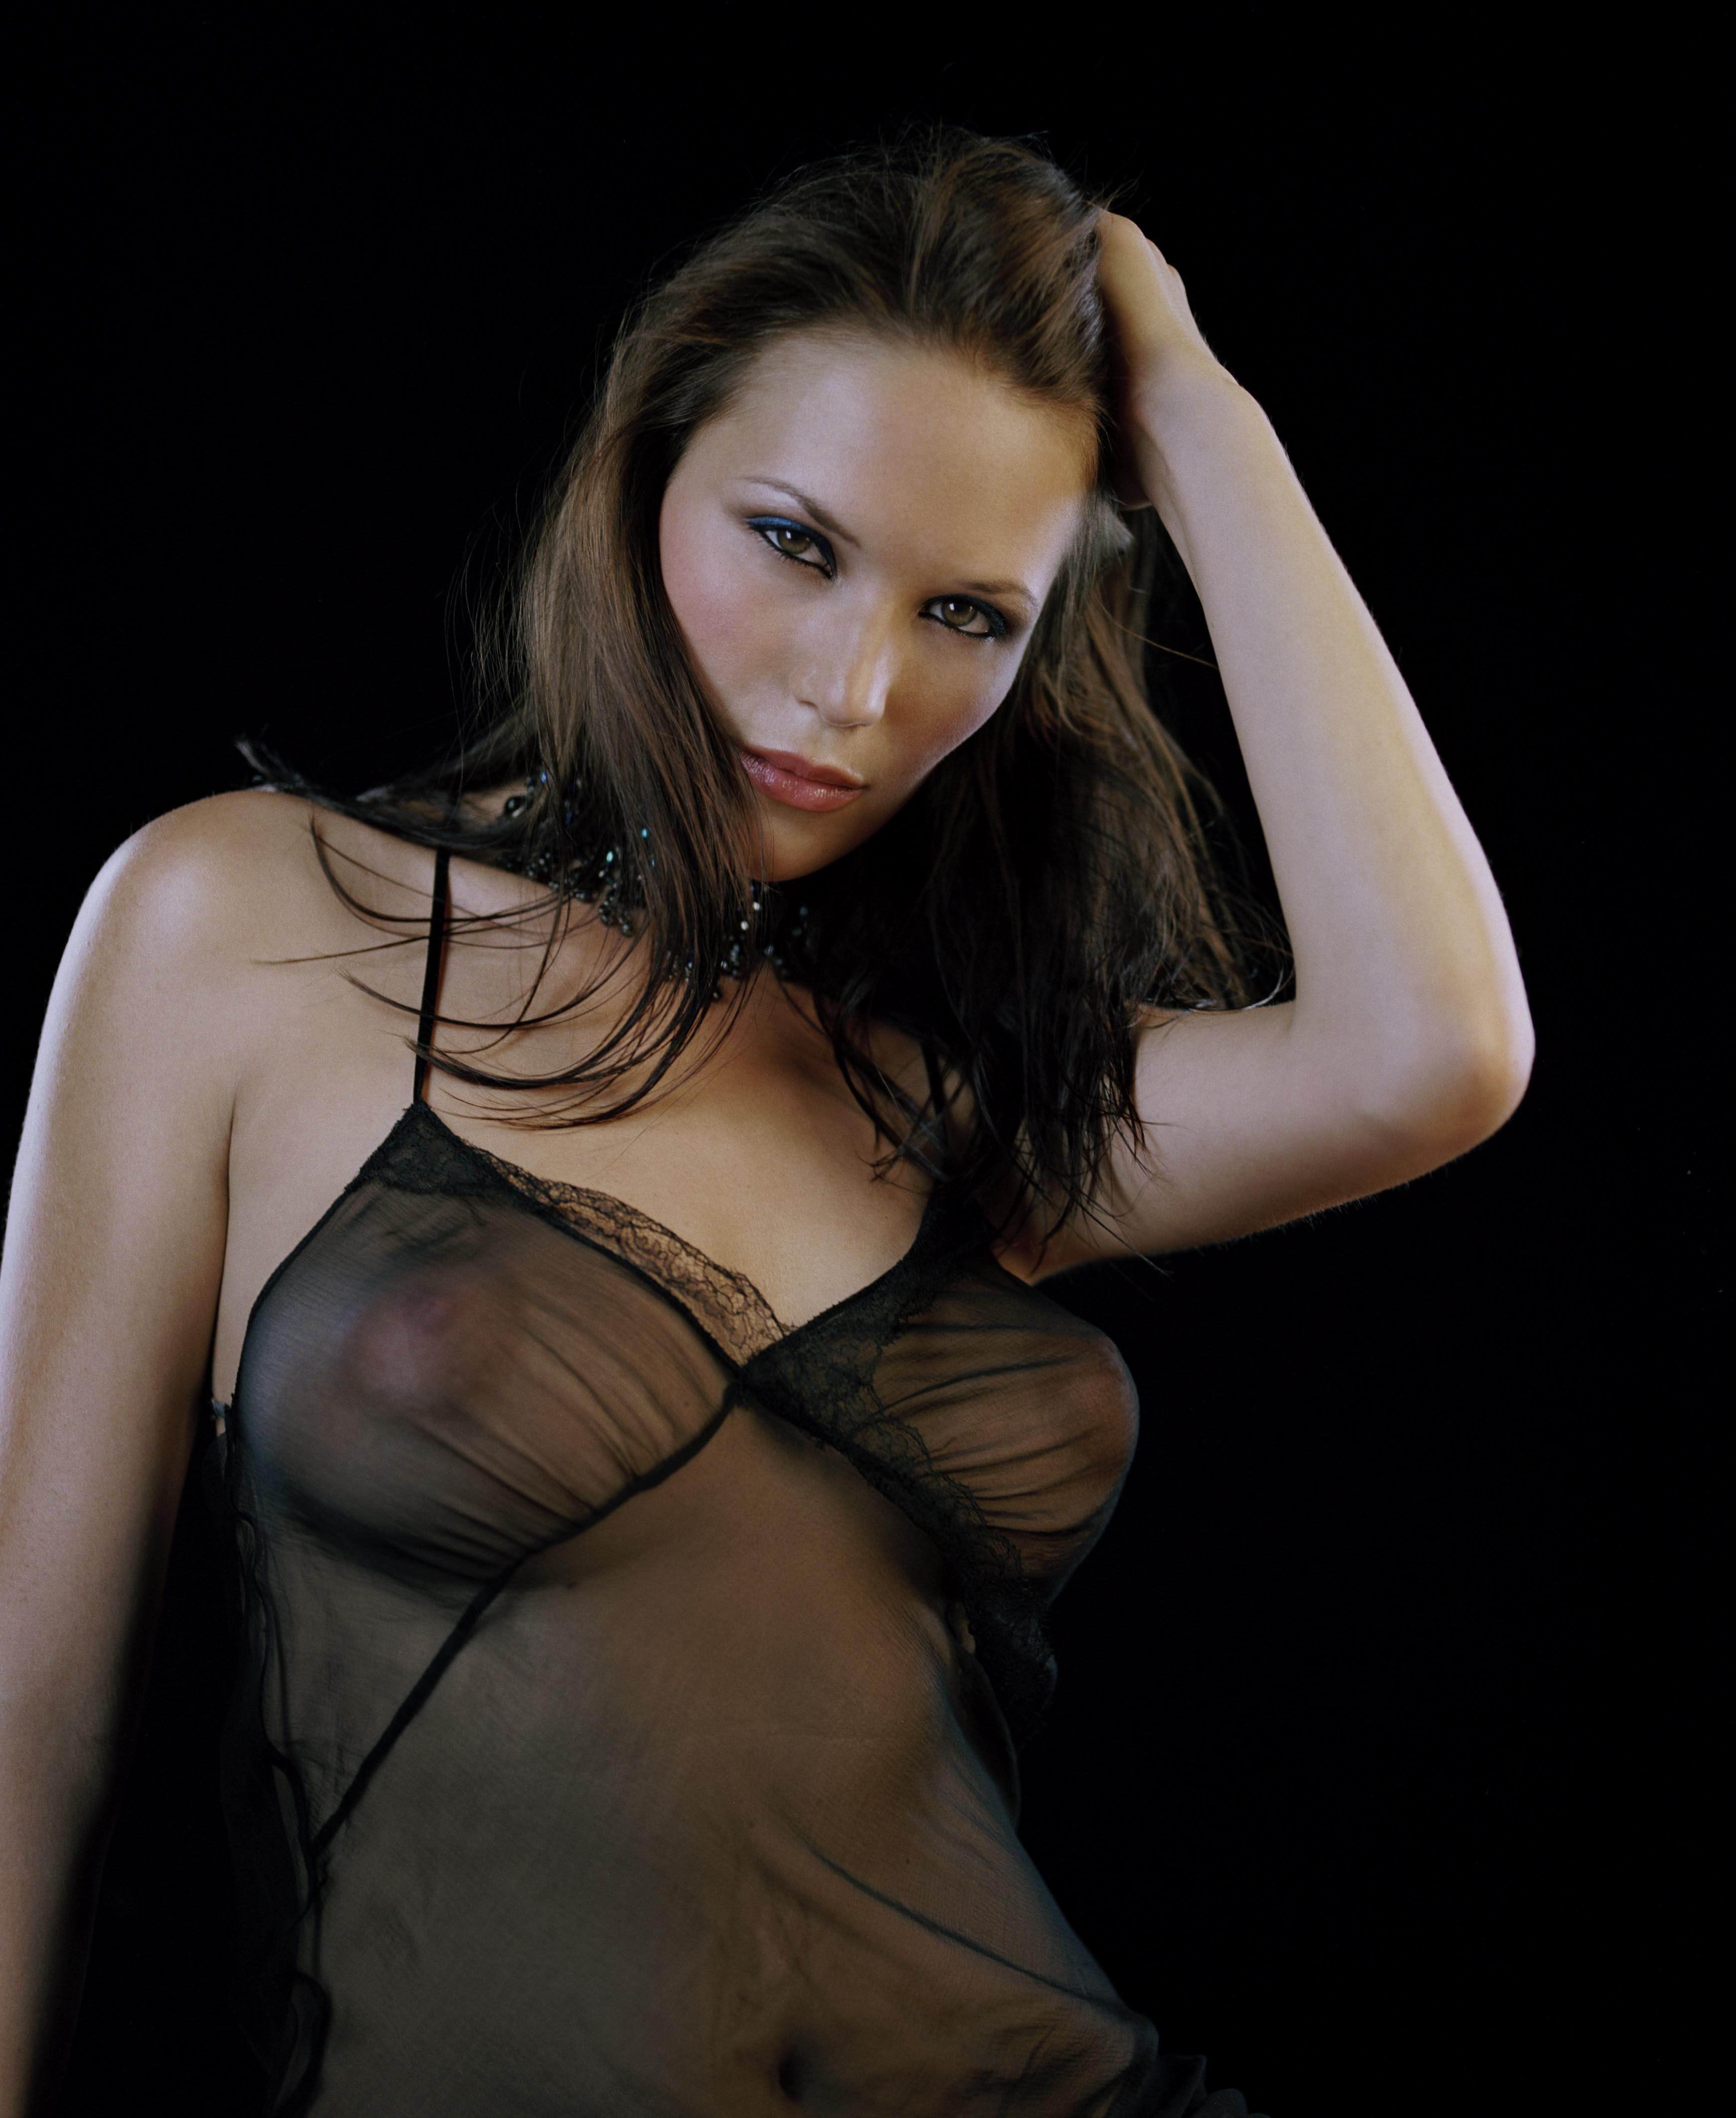 Lucy Clarkson Desnuda Página 5 Fotos Desnuda Descuido Topless